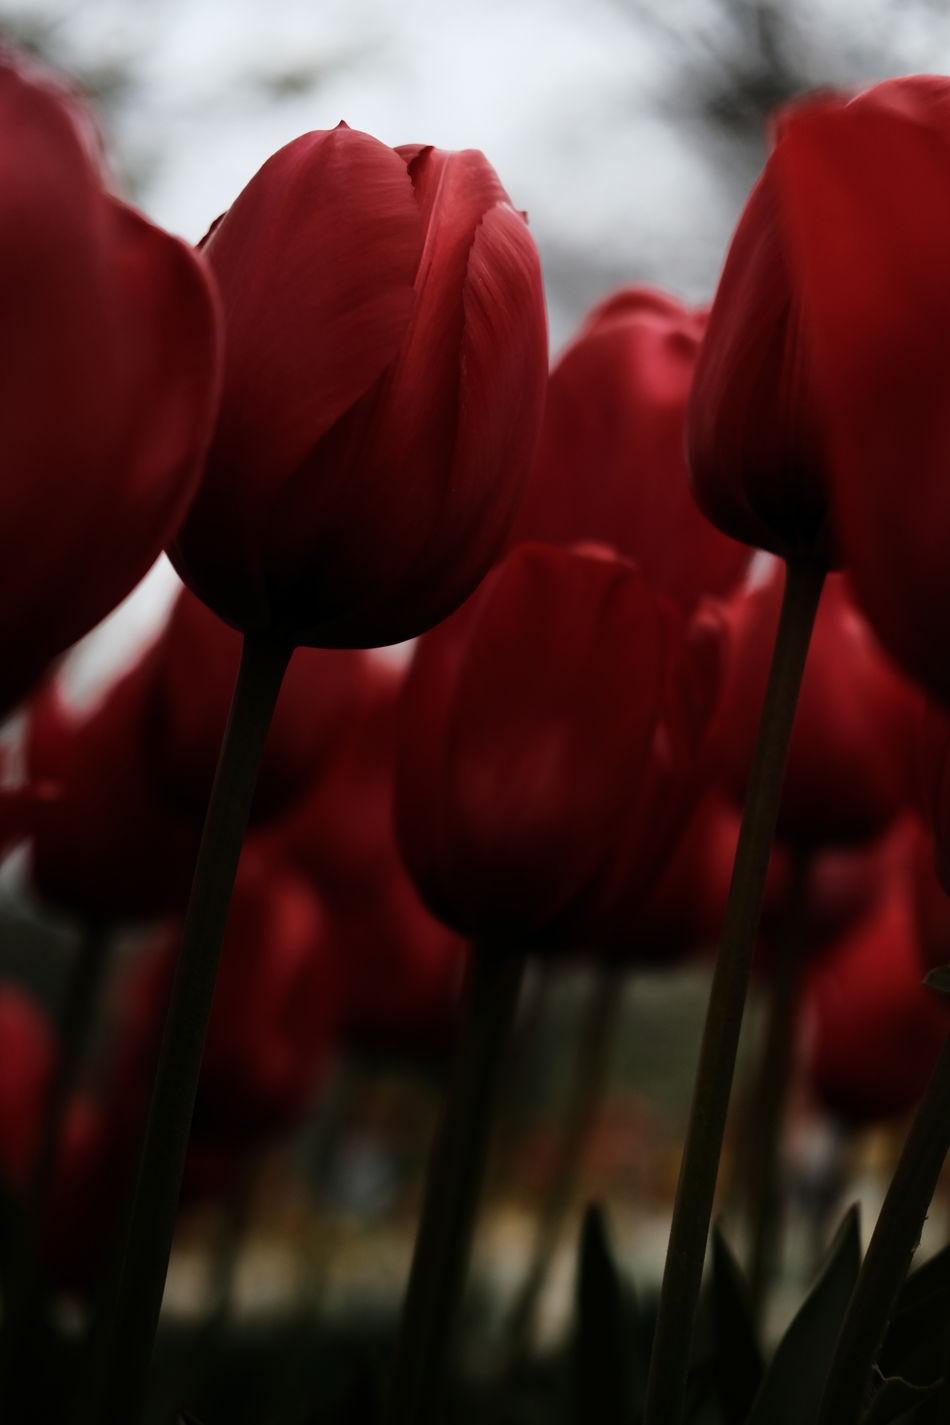 Tulips in Keukenhof (Netherlands) Beauty In Nature Blossom Close-up Day Dramatic Dramatic Angles Flower Flower Head Flowers Fragility Freshness Garden Gardening Green Growth Keukenhof Lisse  Nature Netherlands No People Outdoors Red Tulip Tulpe Yellow Art Is Everywhere